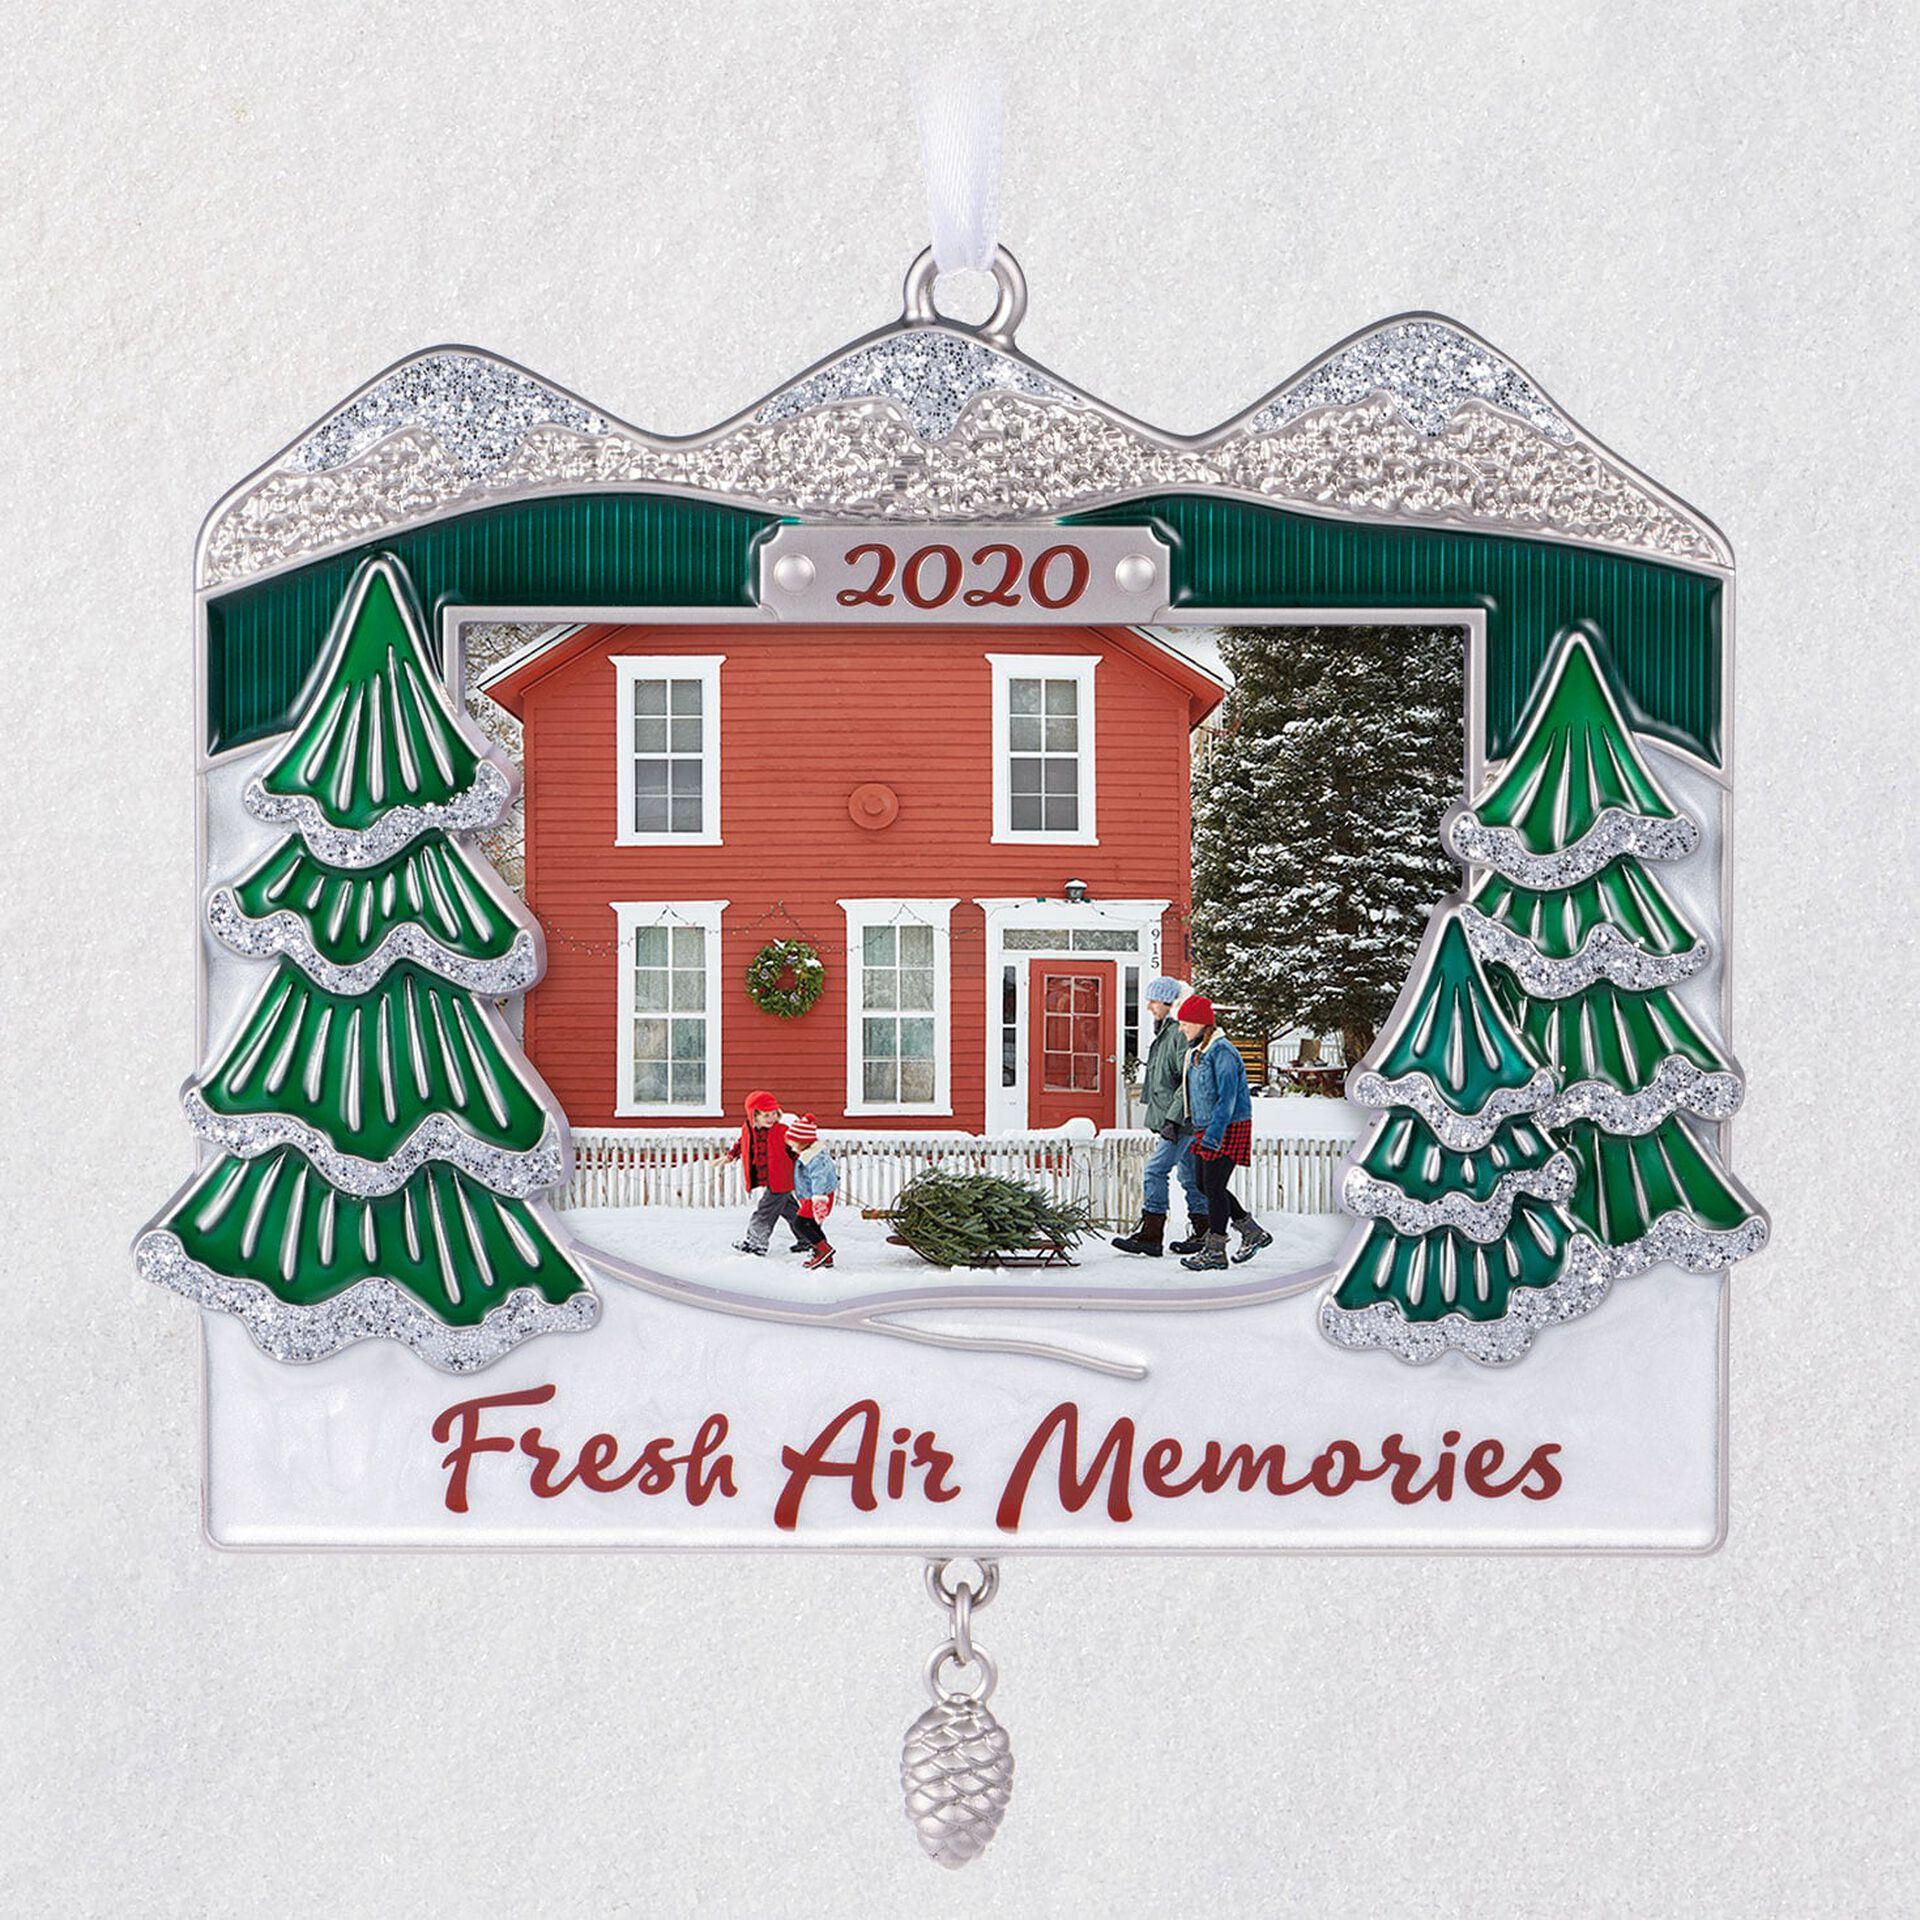 2020 Picture Frame Christmas Ornament Mountainous Memories 2020 Metal Photo Frame Ornament   Keepsake